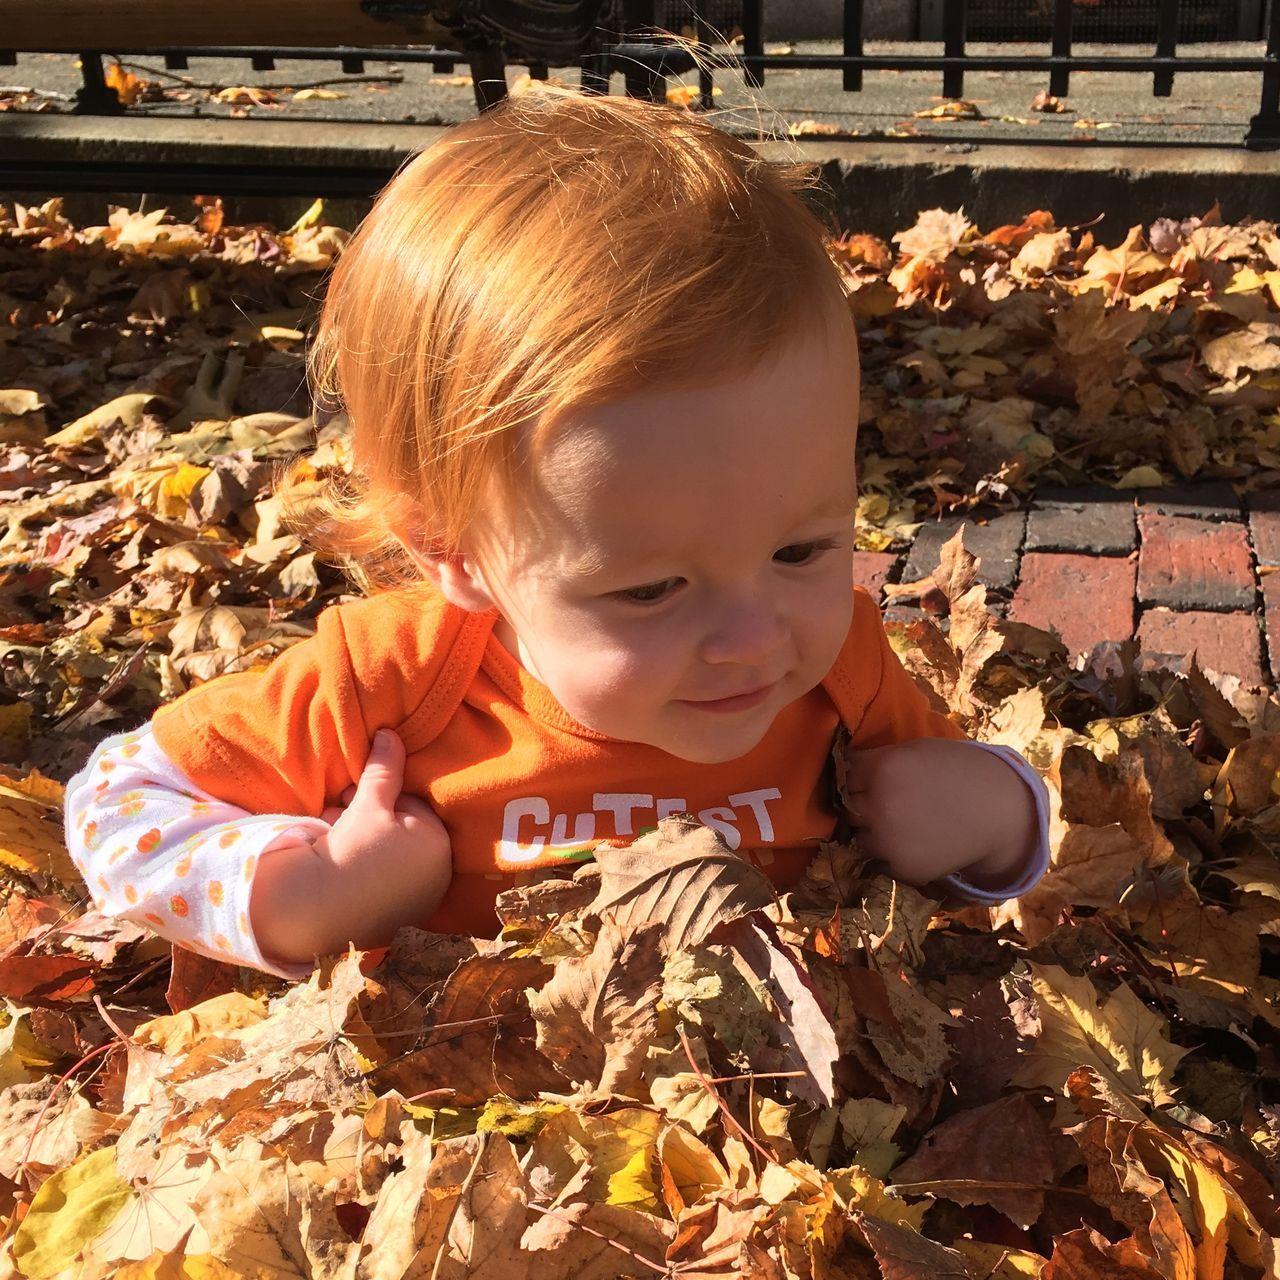 All Orange Fall Leaves Orange Redhead Baby In Leaves Leaf 🍂 Leafs Leaf Pile Baby Girl Color Pallete Color Palette